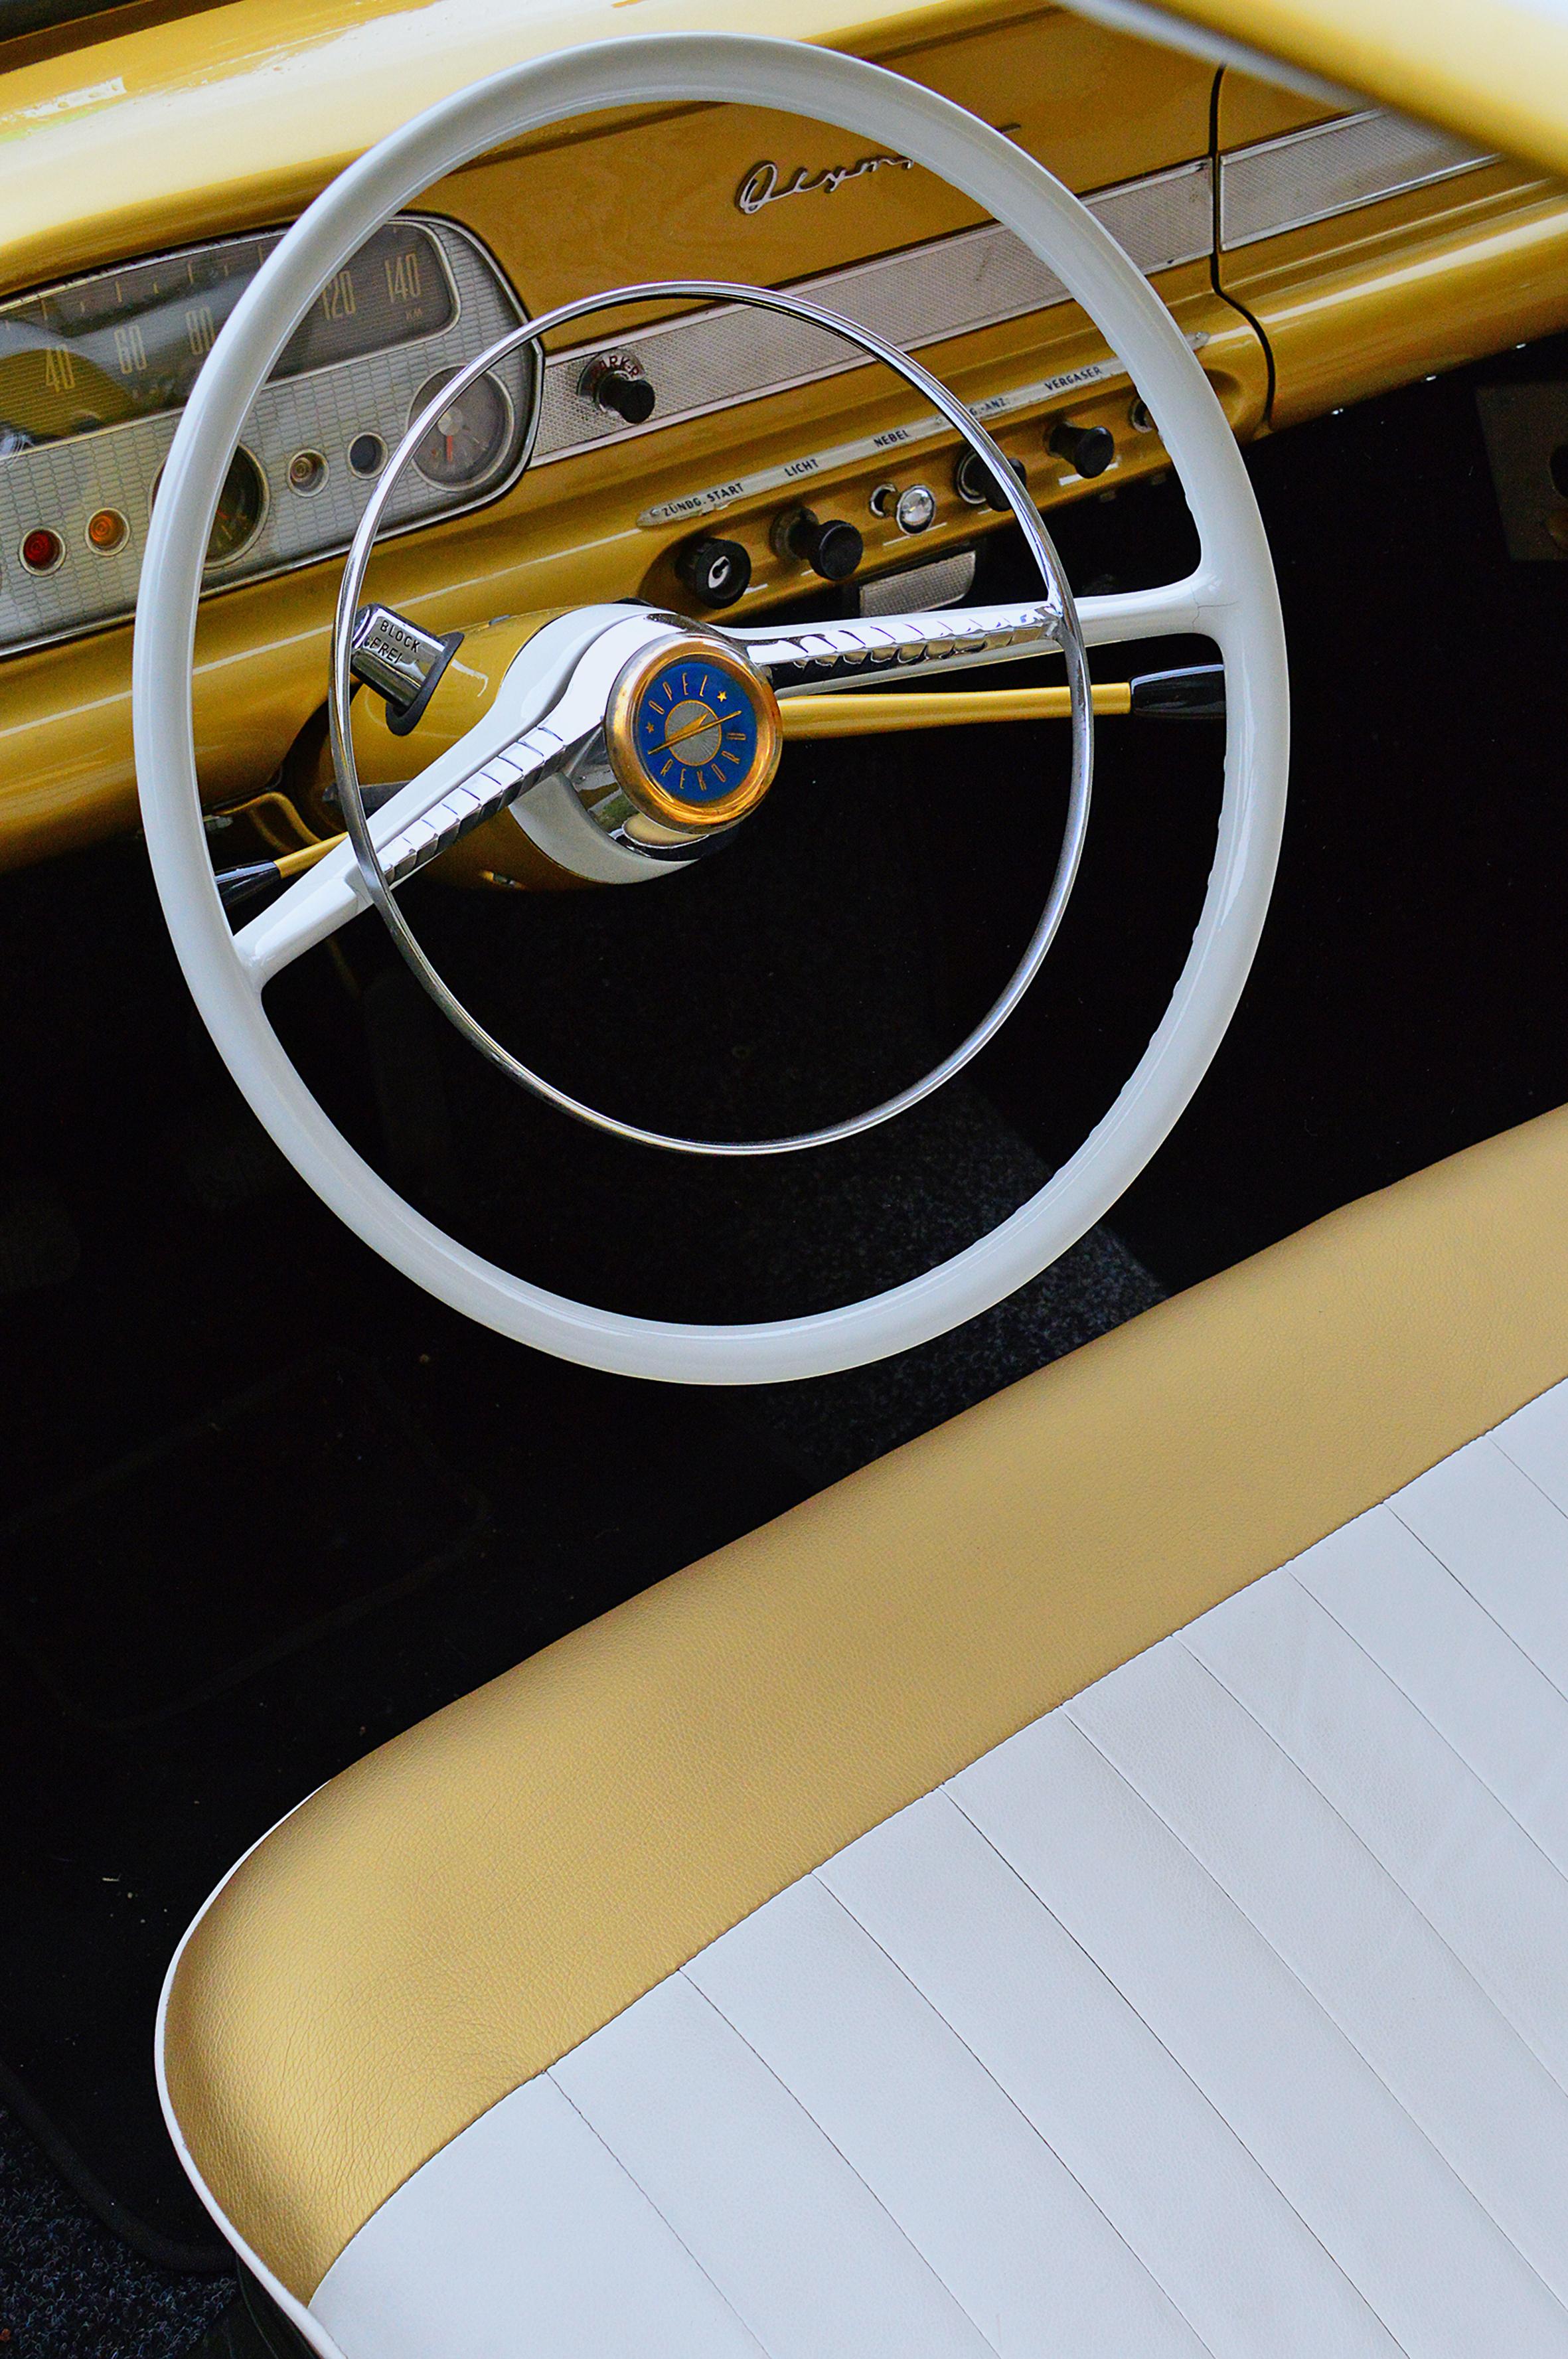 Free Images Old Cars Retro Interior White Transport Black